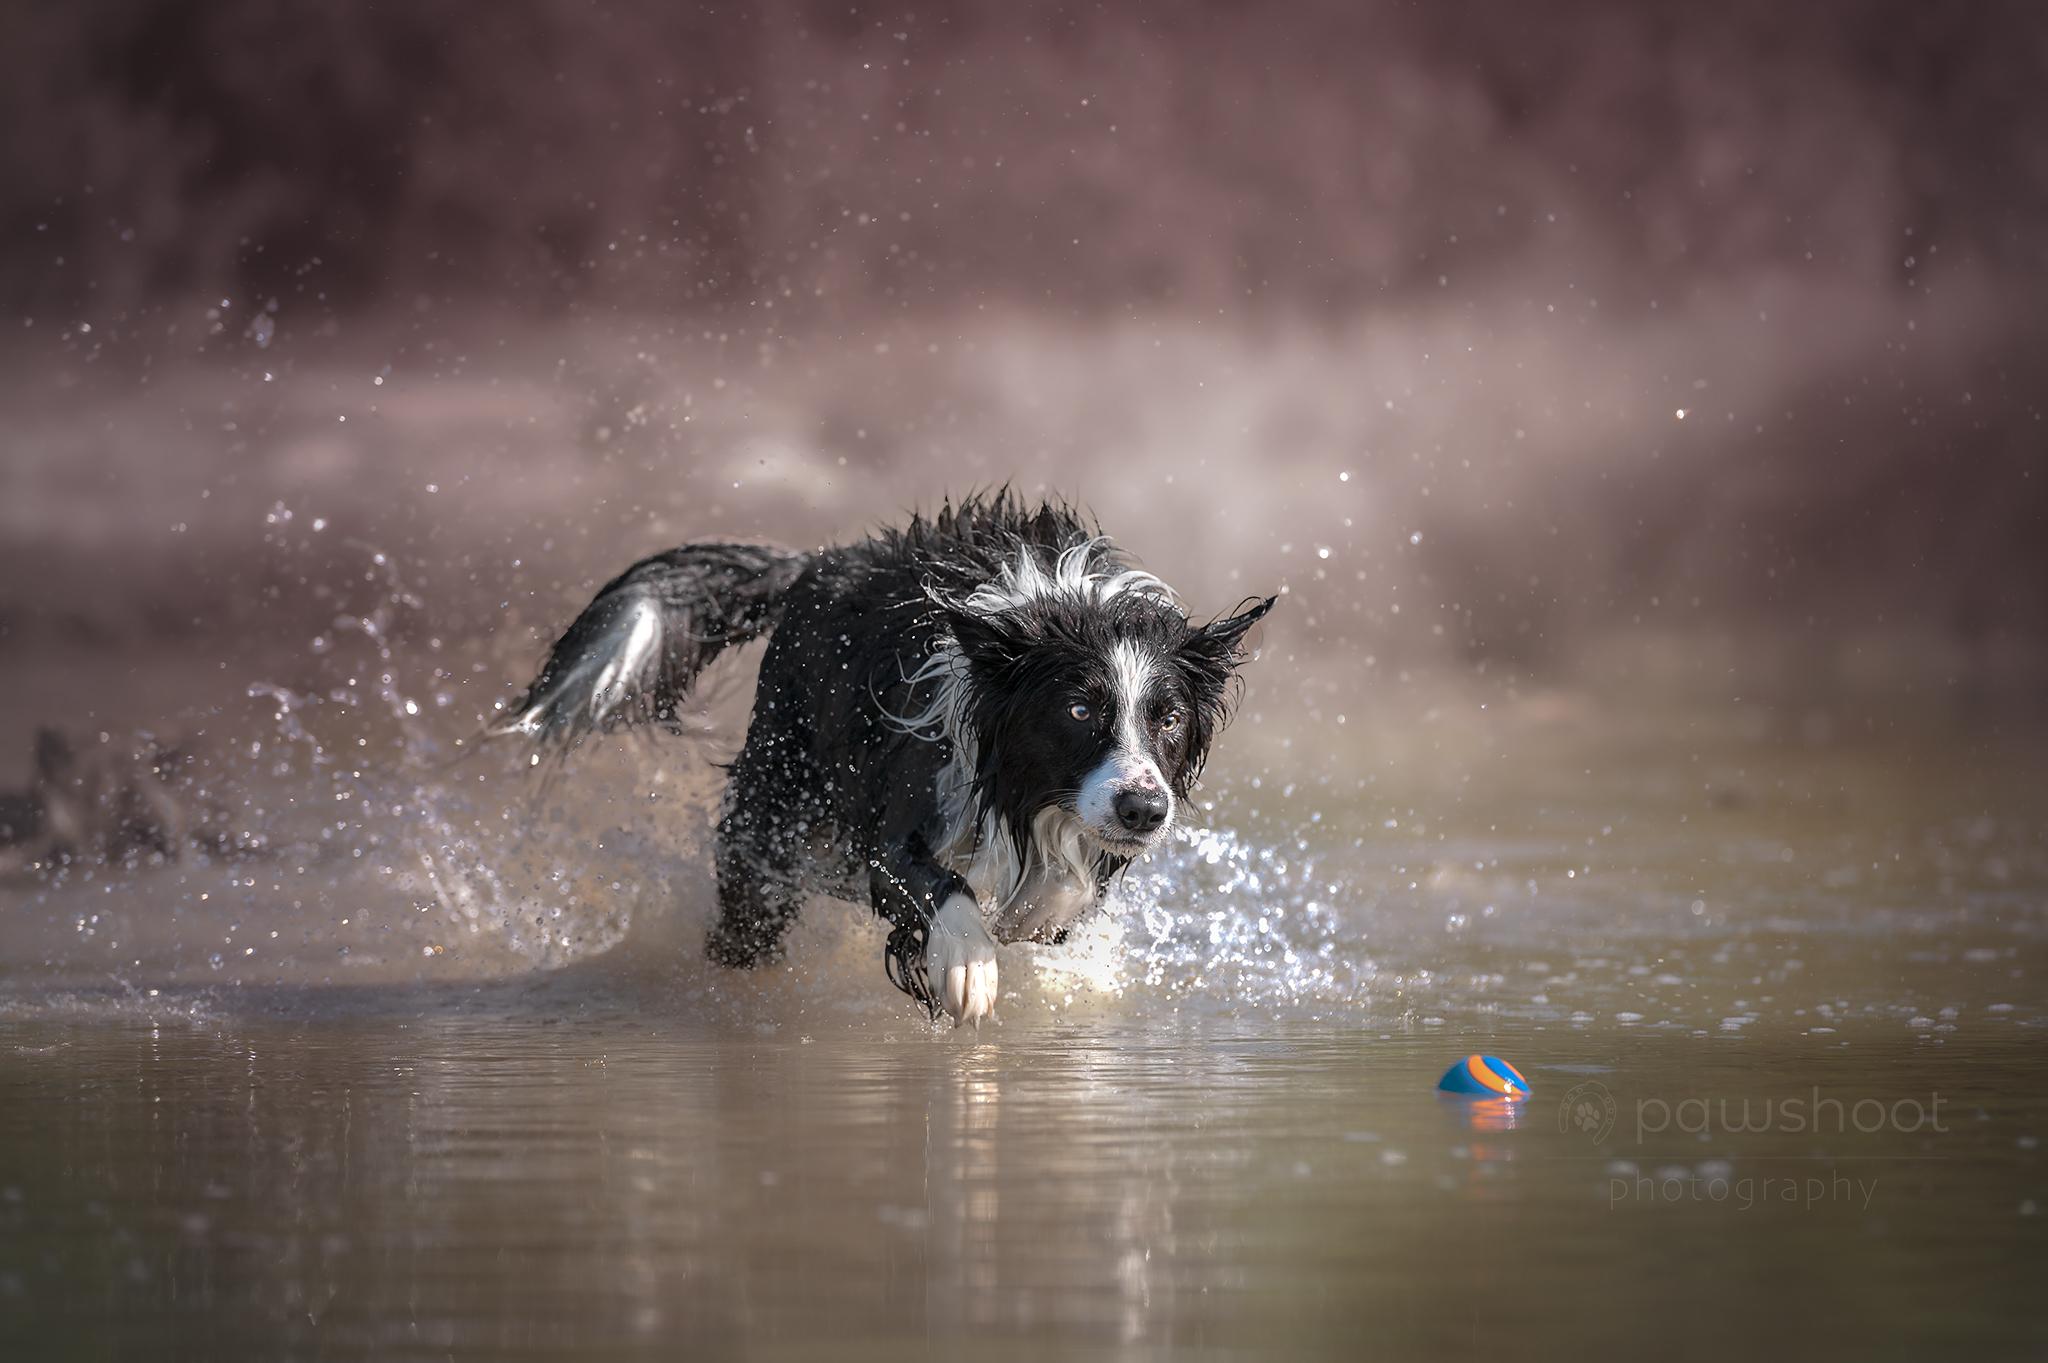 Hond in water Pawshoot hondenfotografie